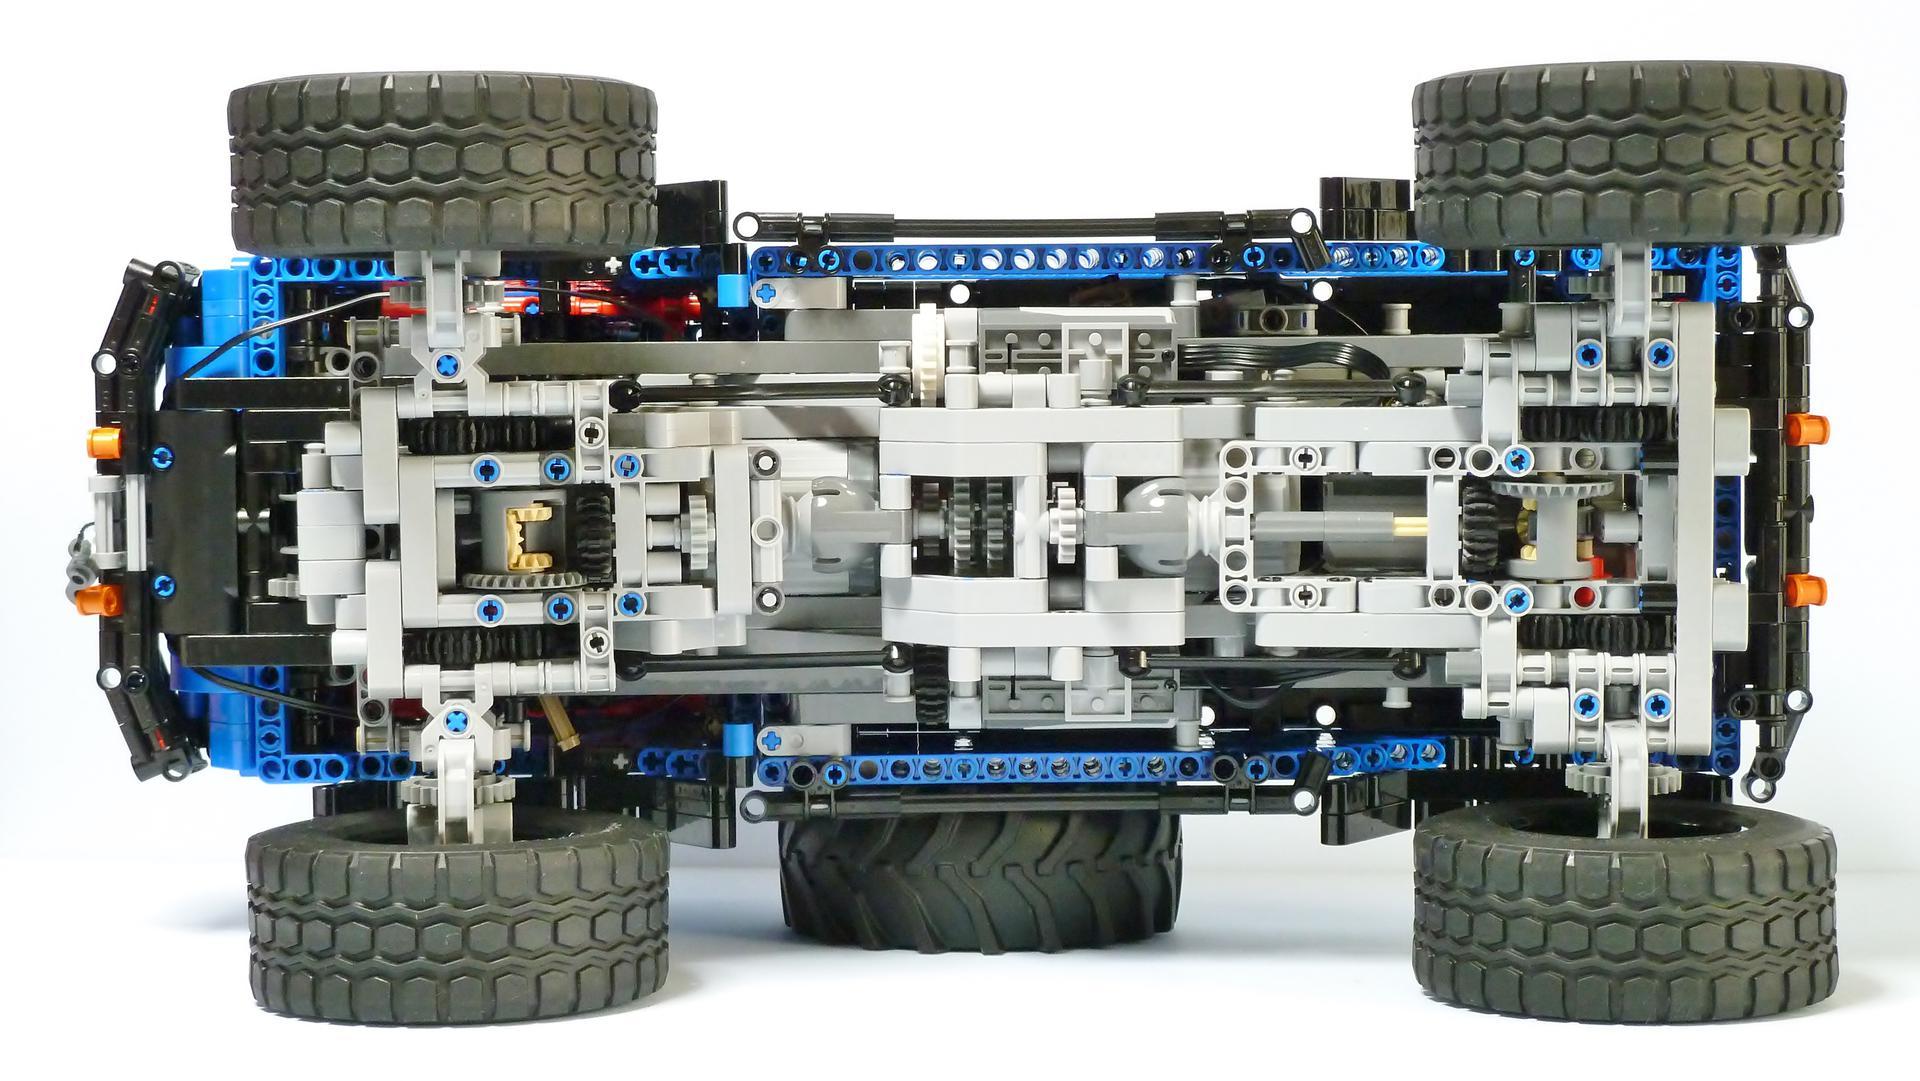 jeep mighty fc concept bricksafe. Black Bedroom Furniture Sets. Home Design Ideas